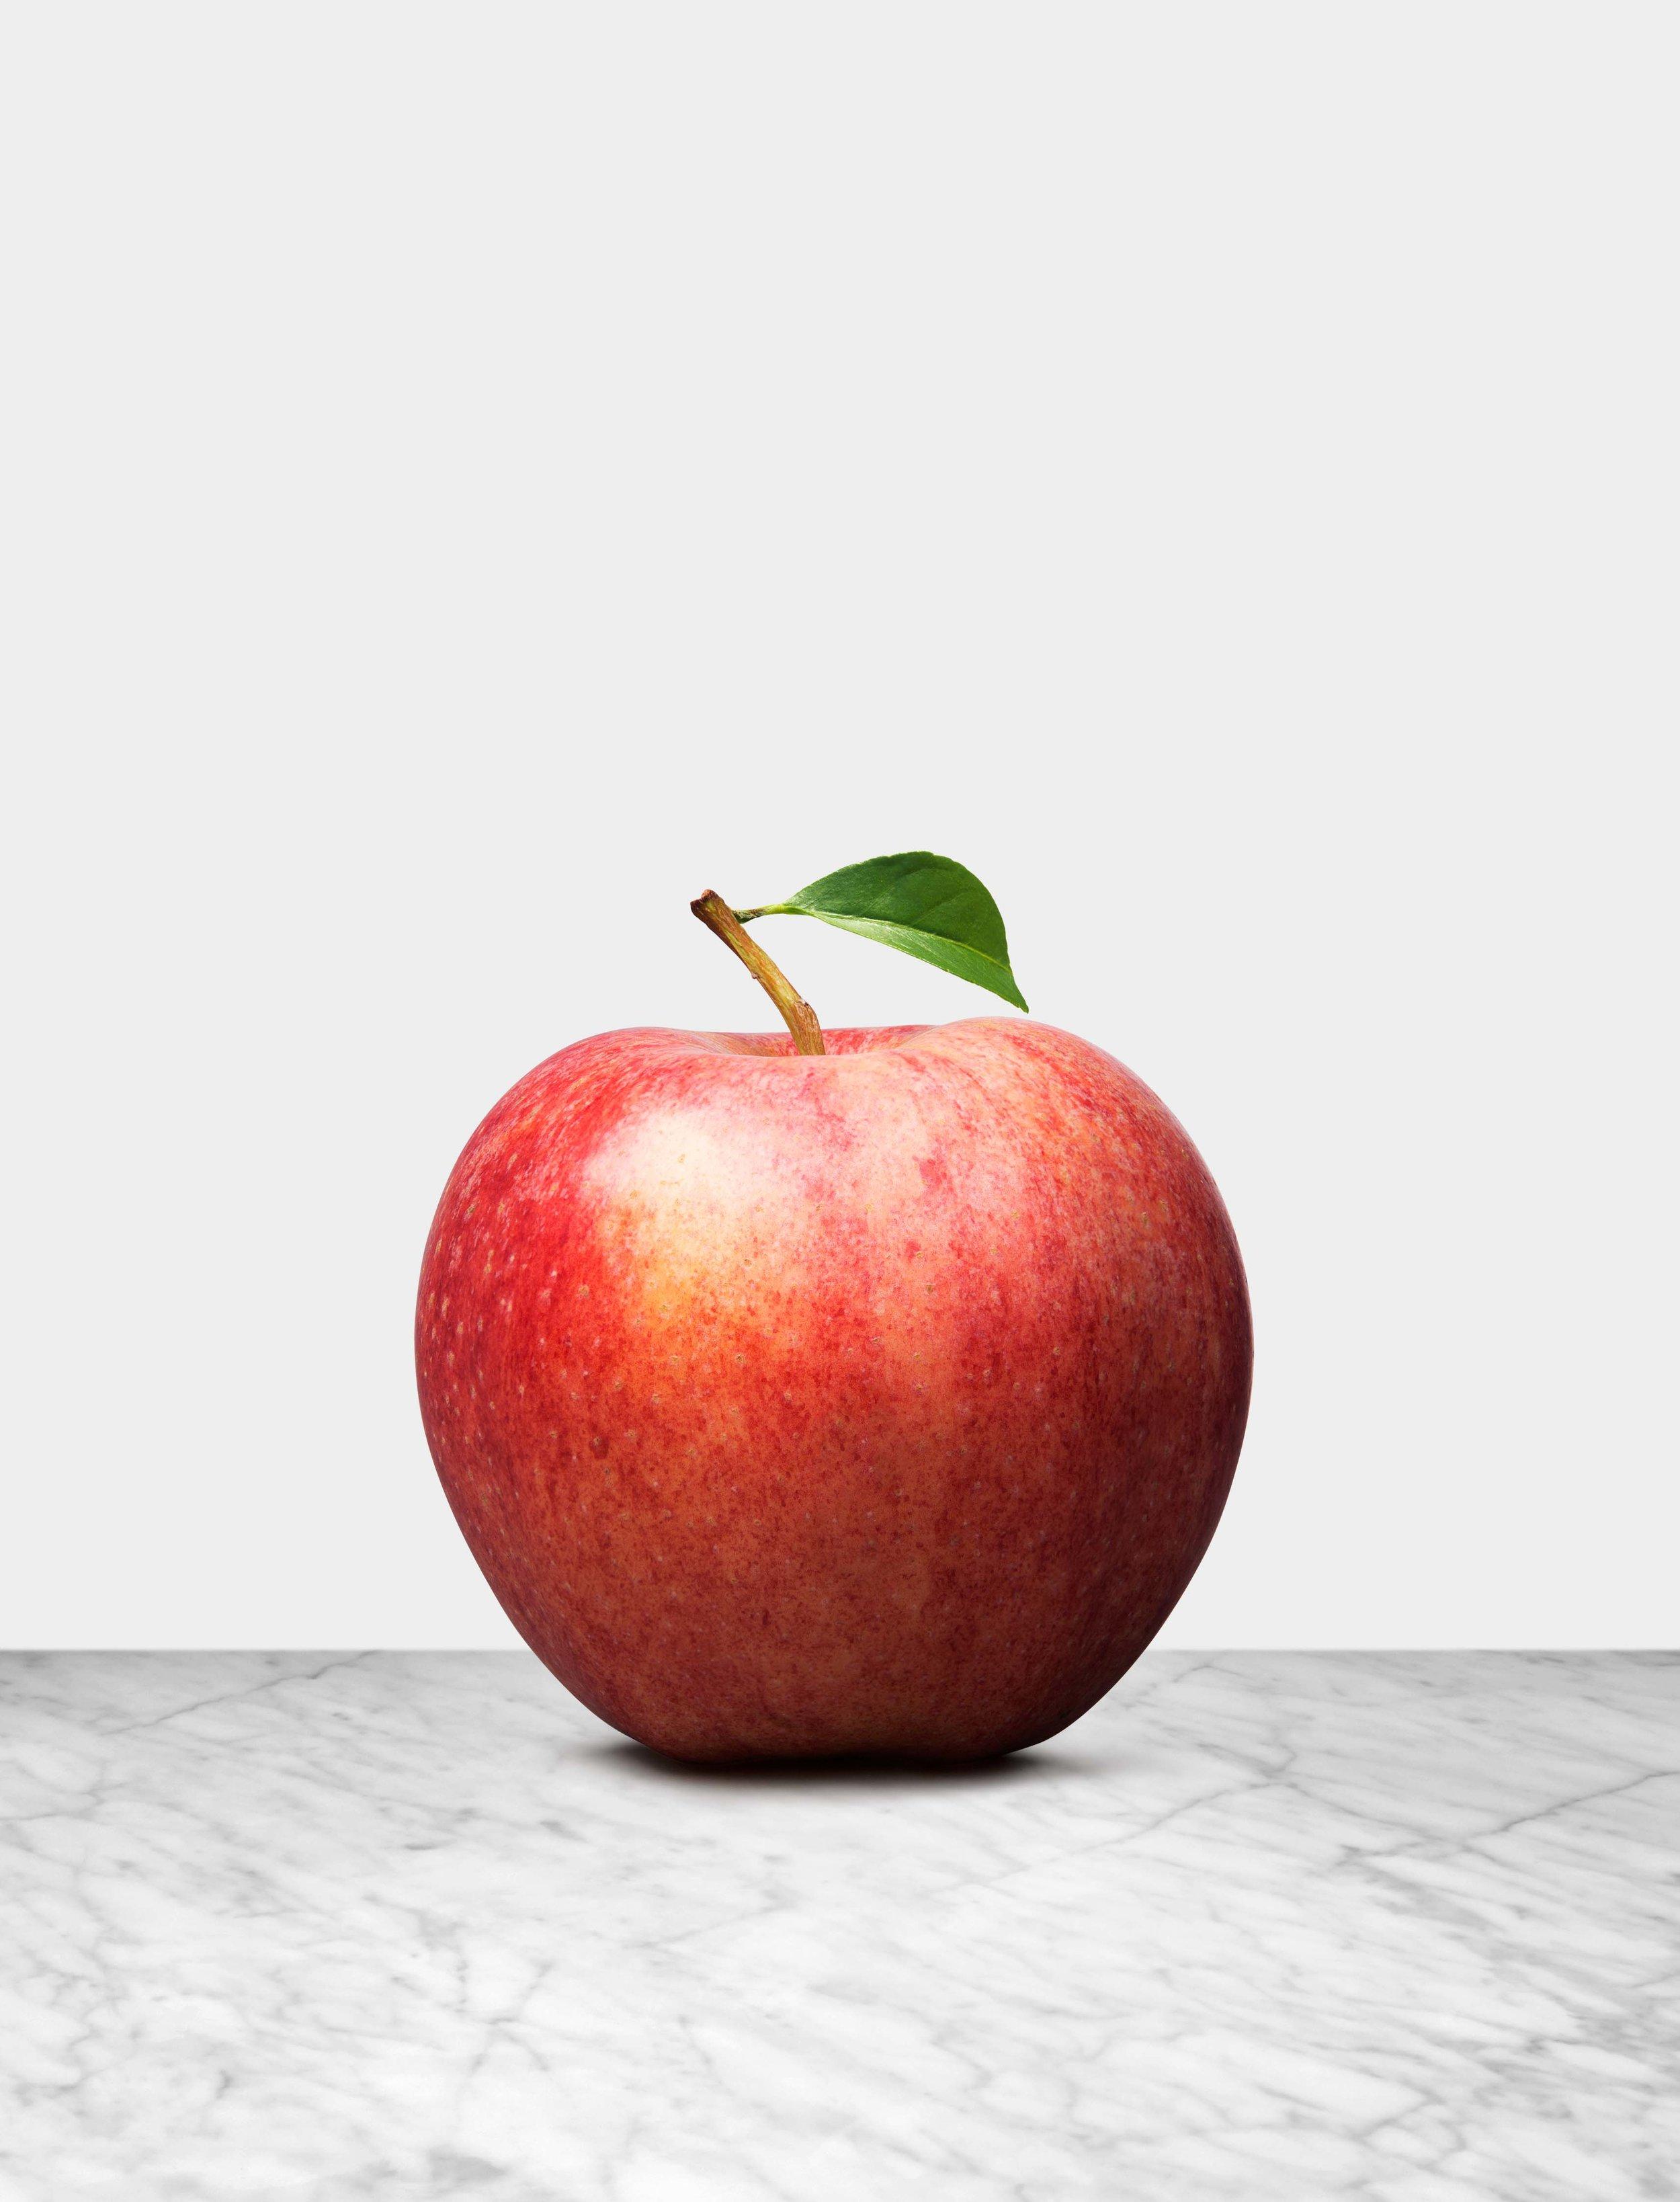 Äpple kopiera kopia.jpg